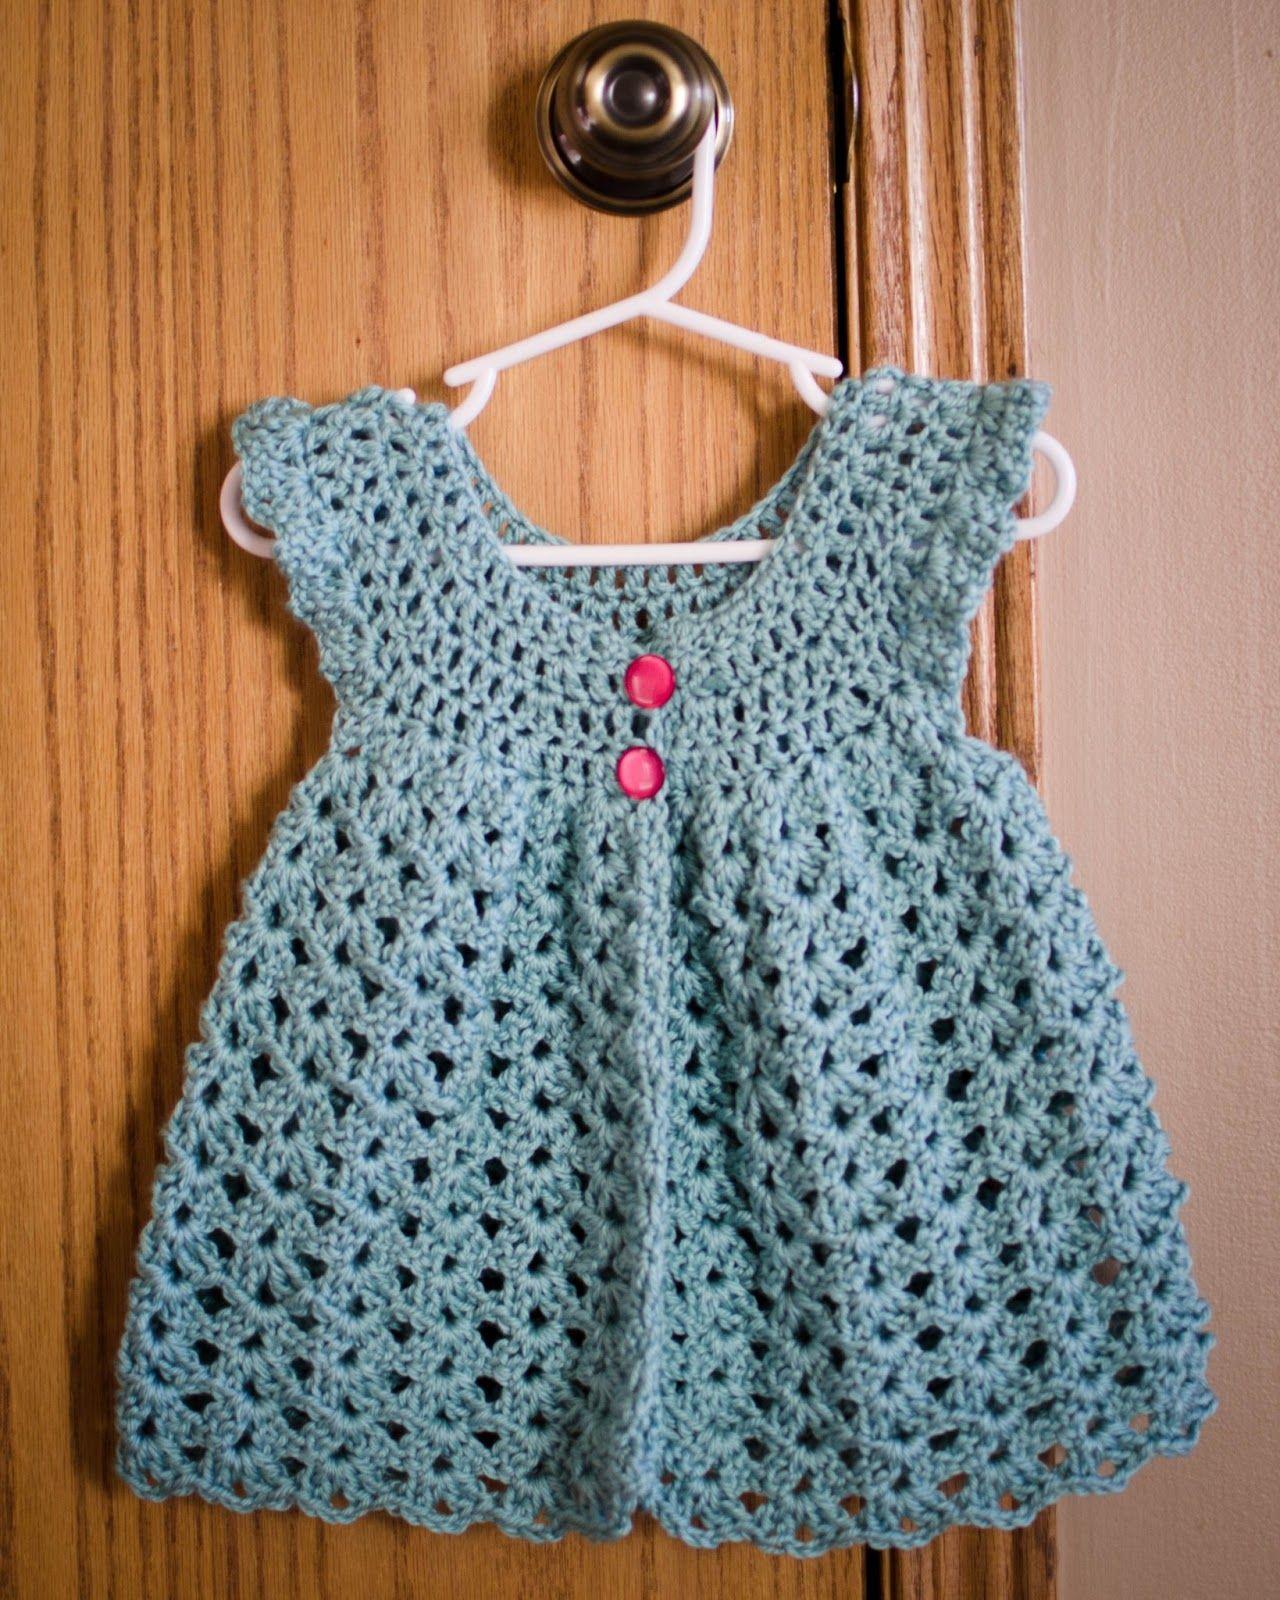 Vintage Crochet Dress | DaisiesforViolet.com | Pinterest ...